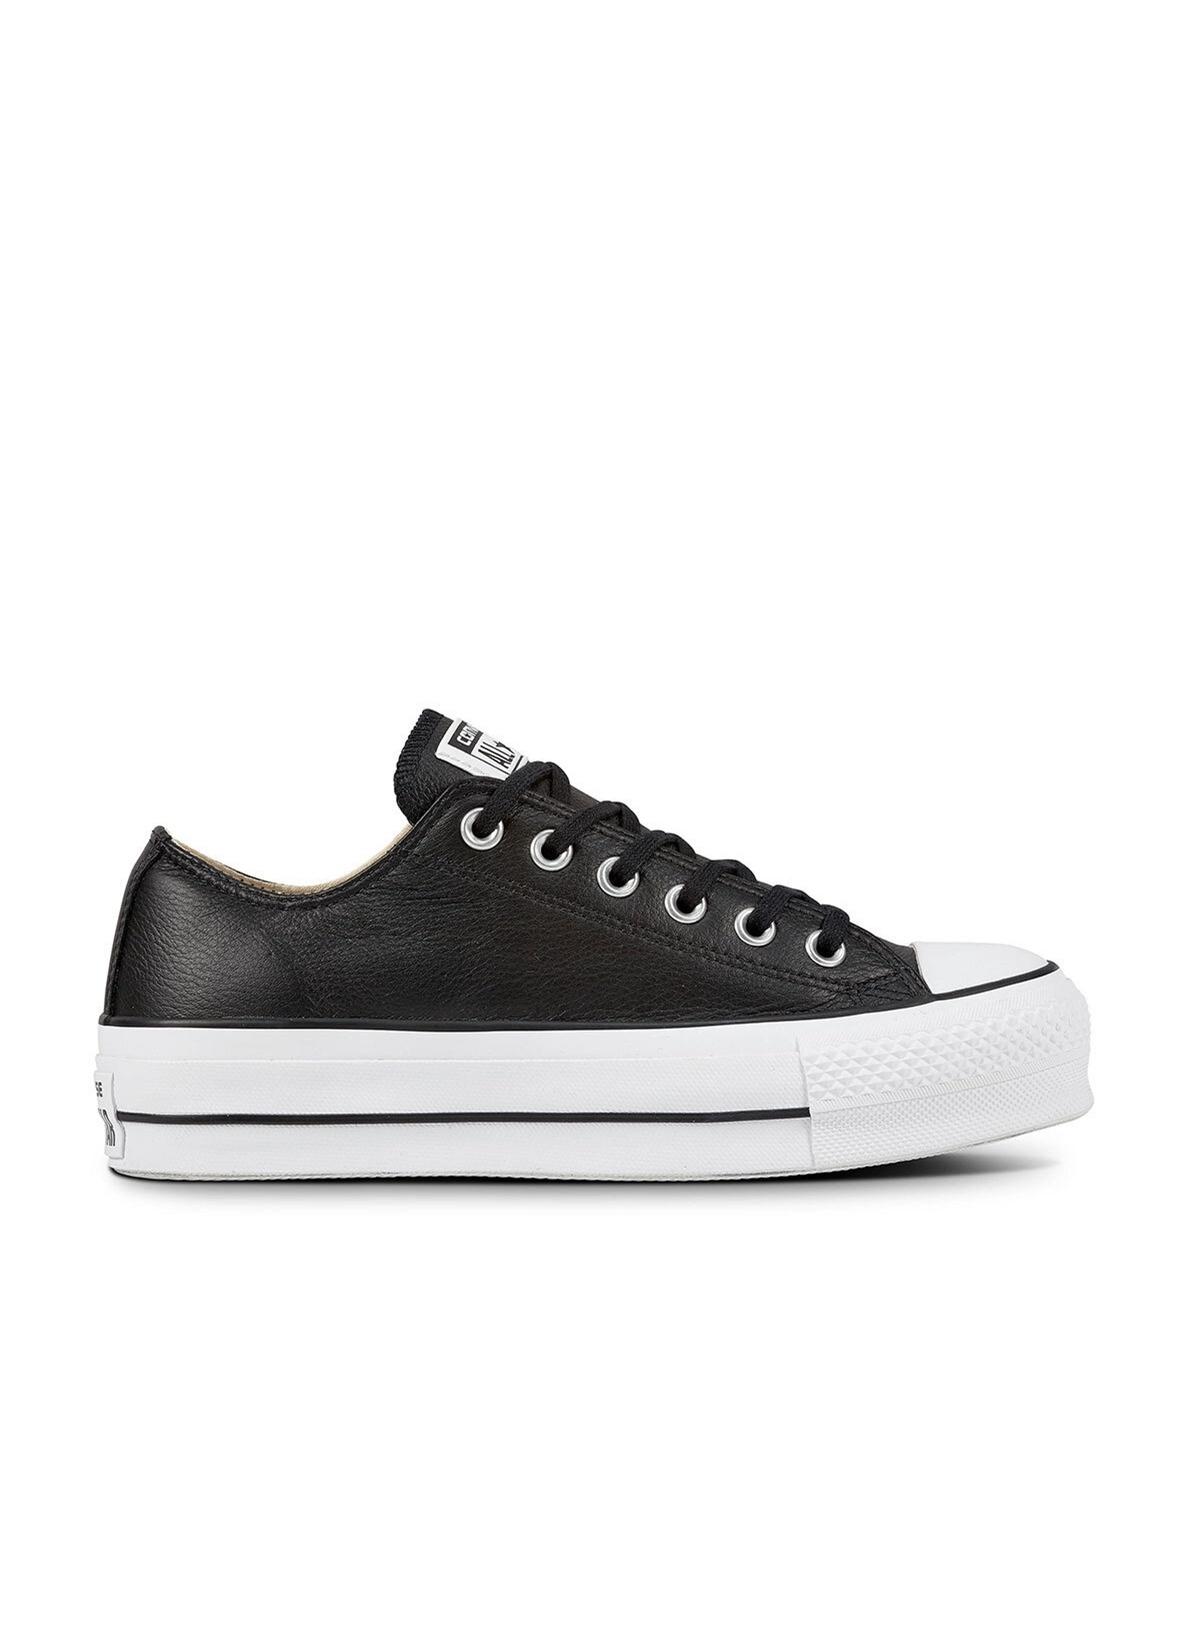 Converse Sneakers 561681c All Star Lift High Siyah Sneaker – 433.0 TL